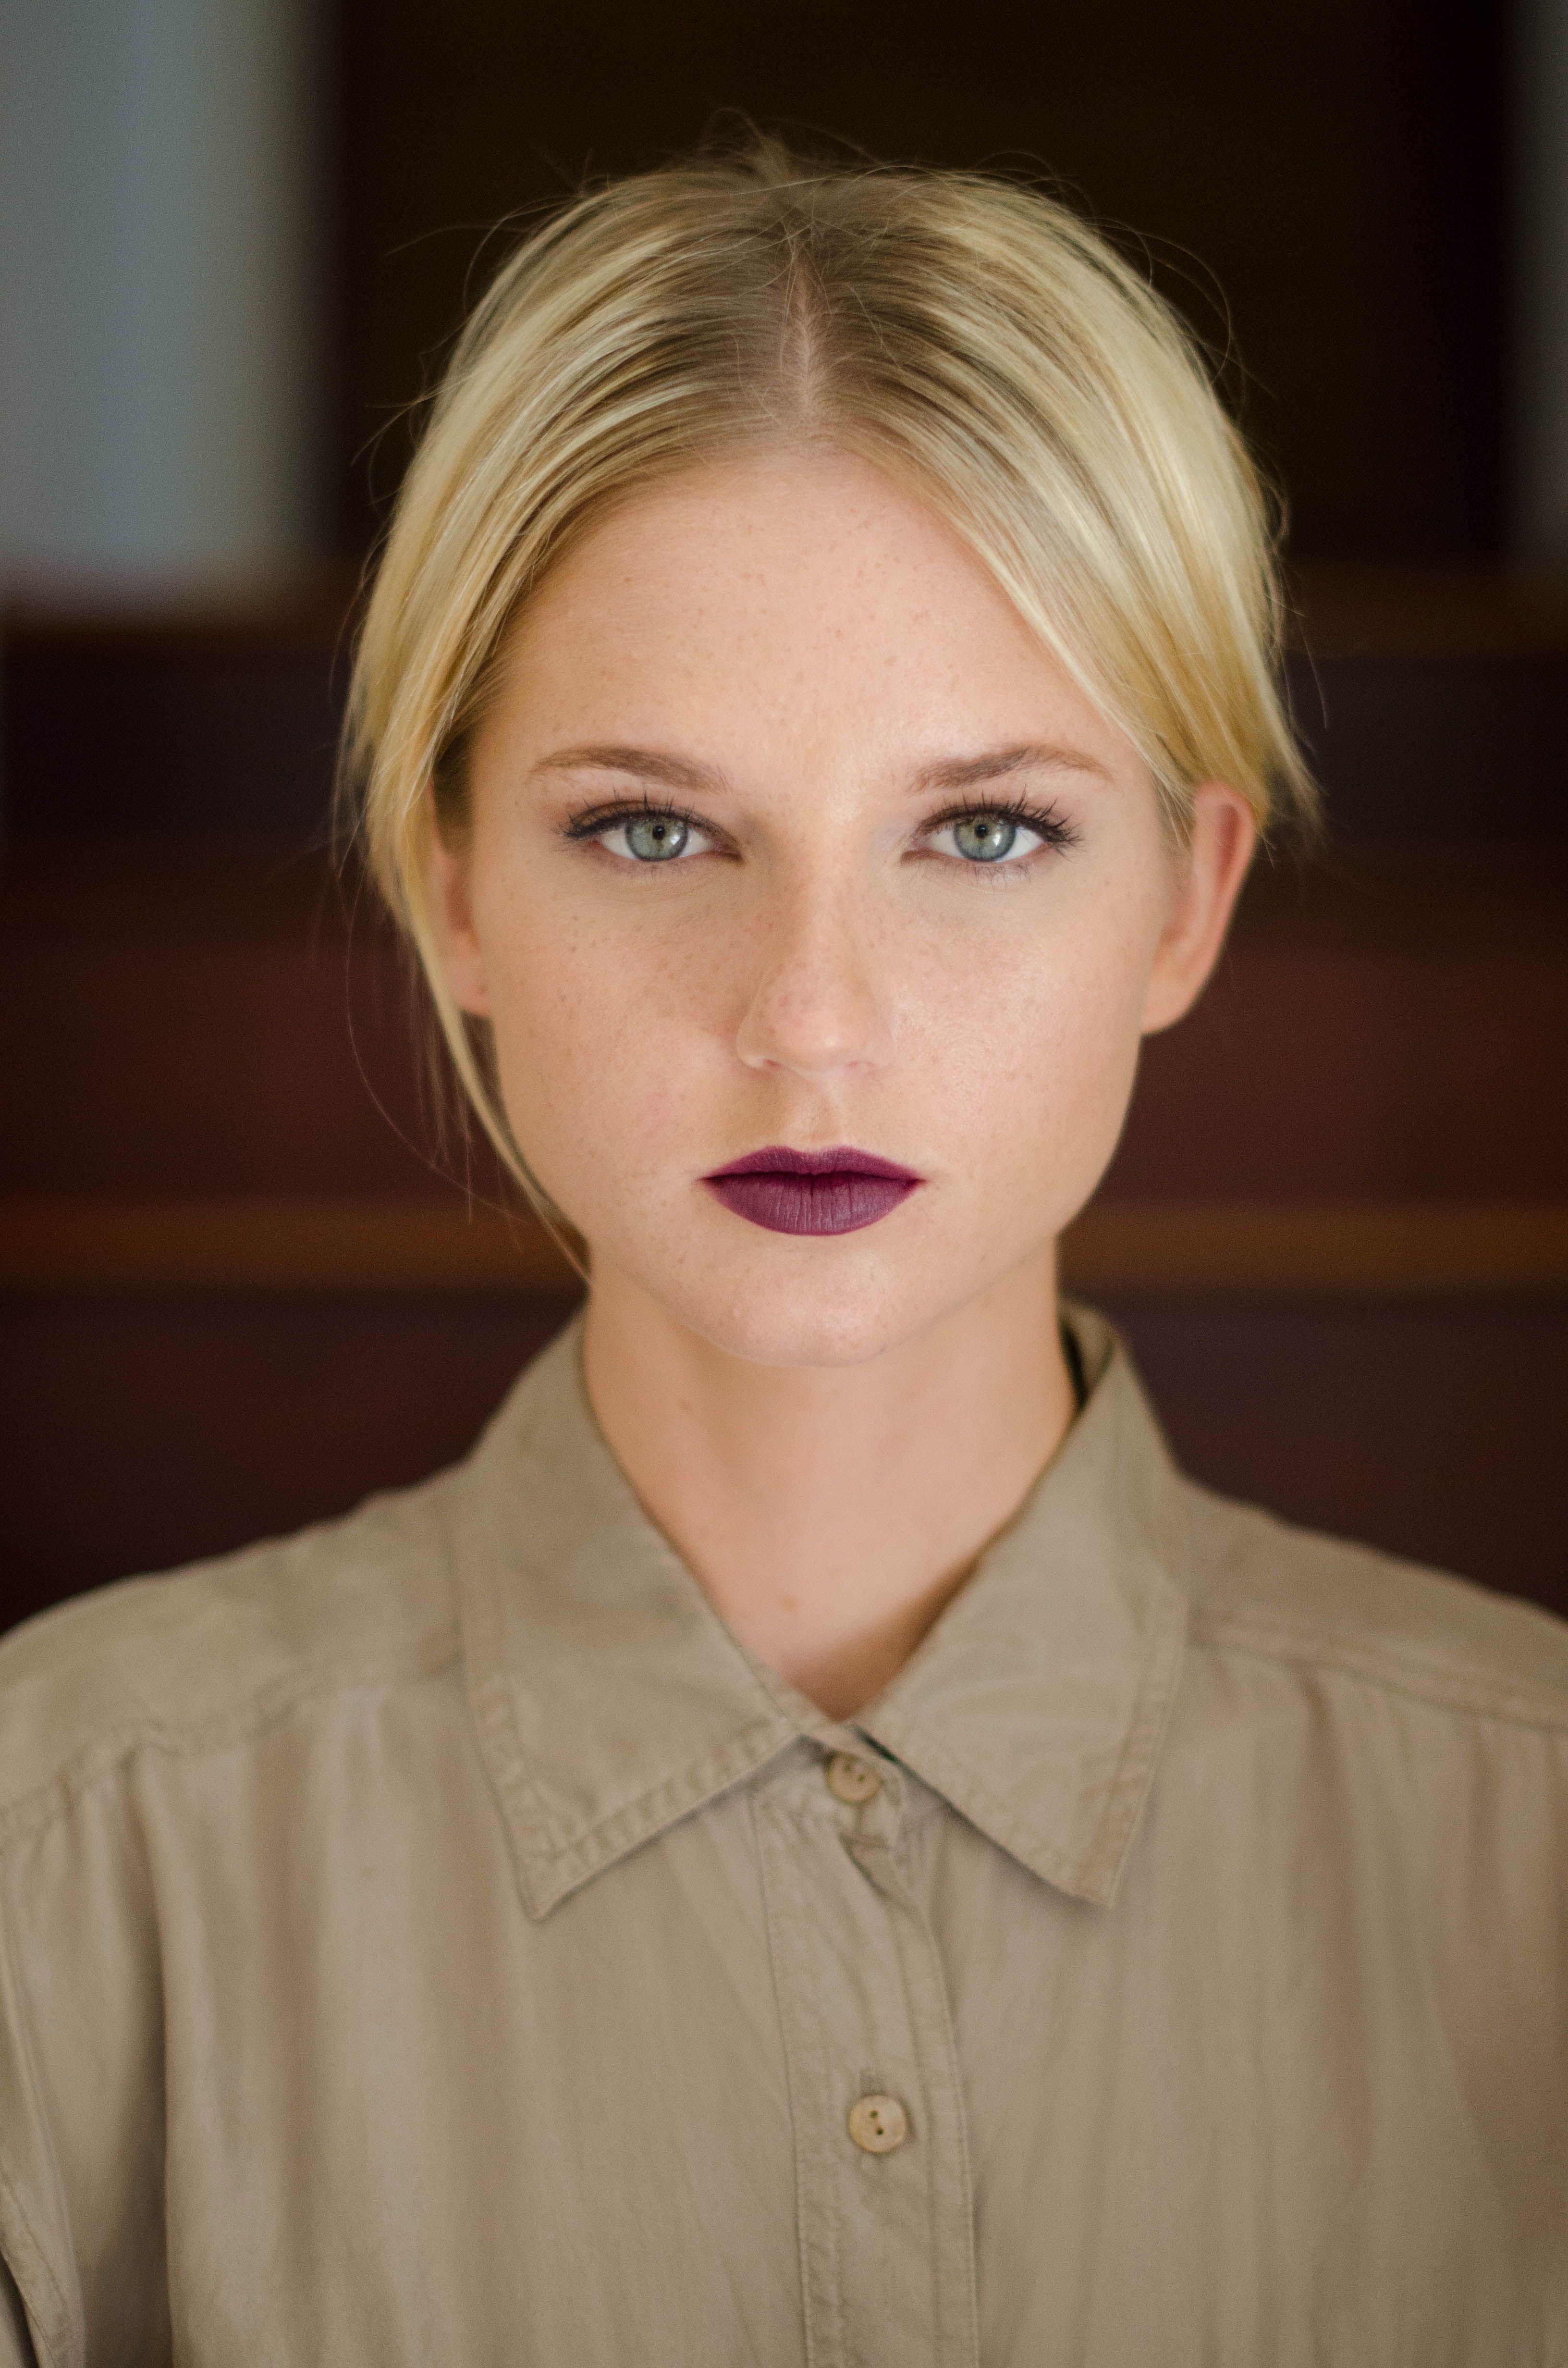 Stunning natural makeup with a bold lip! Makeup by Amber